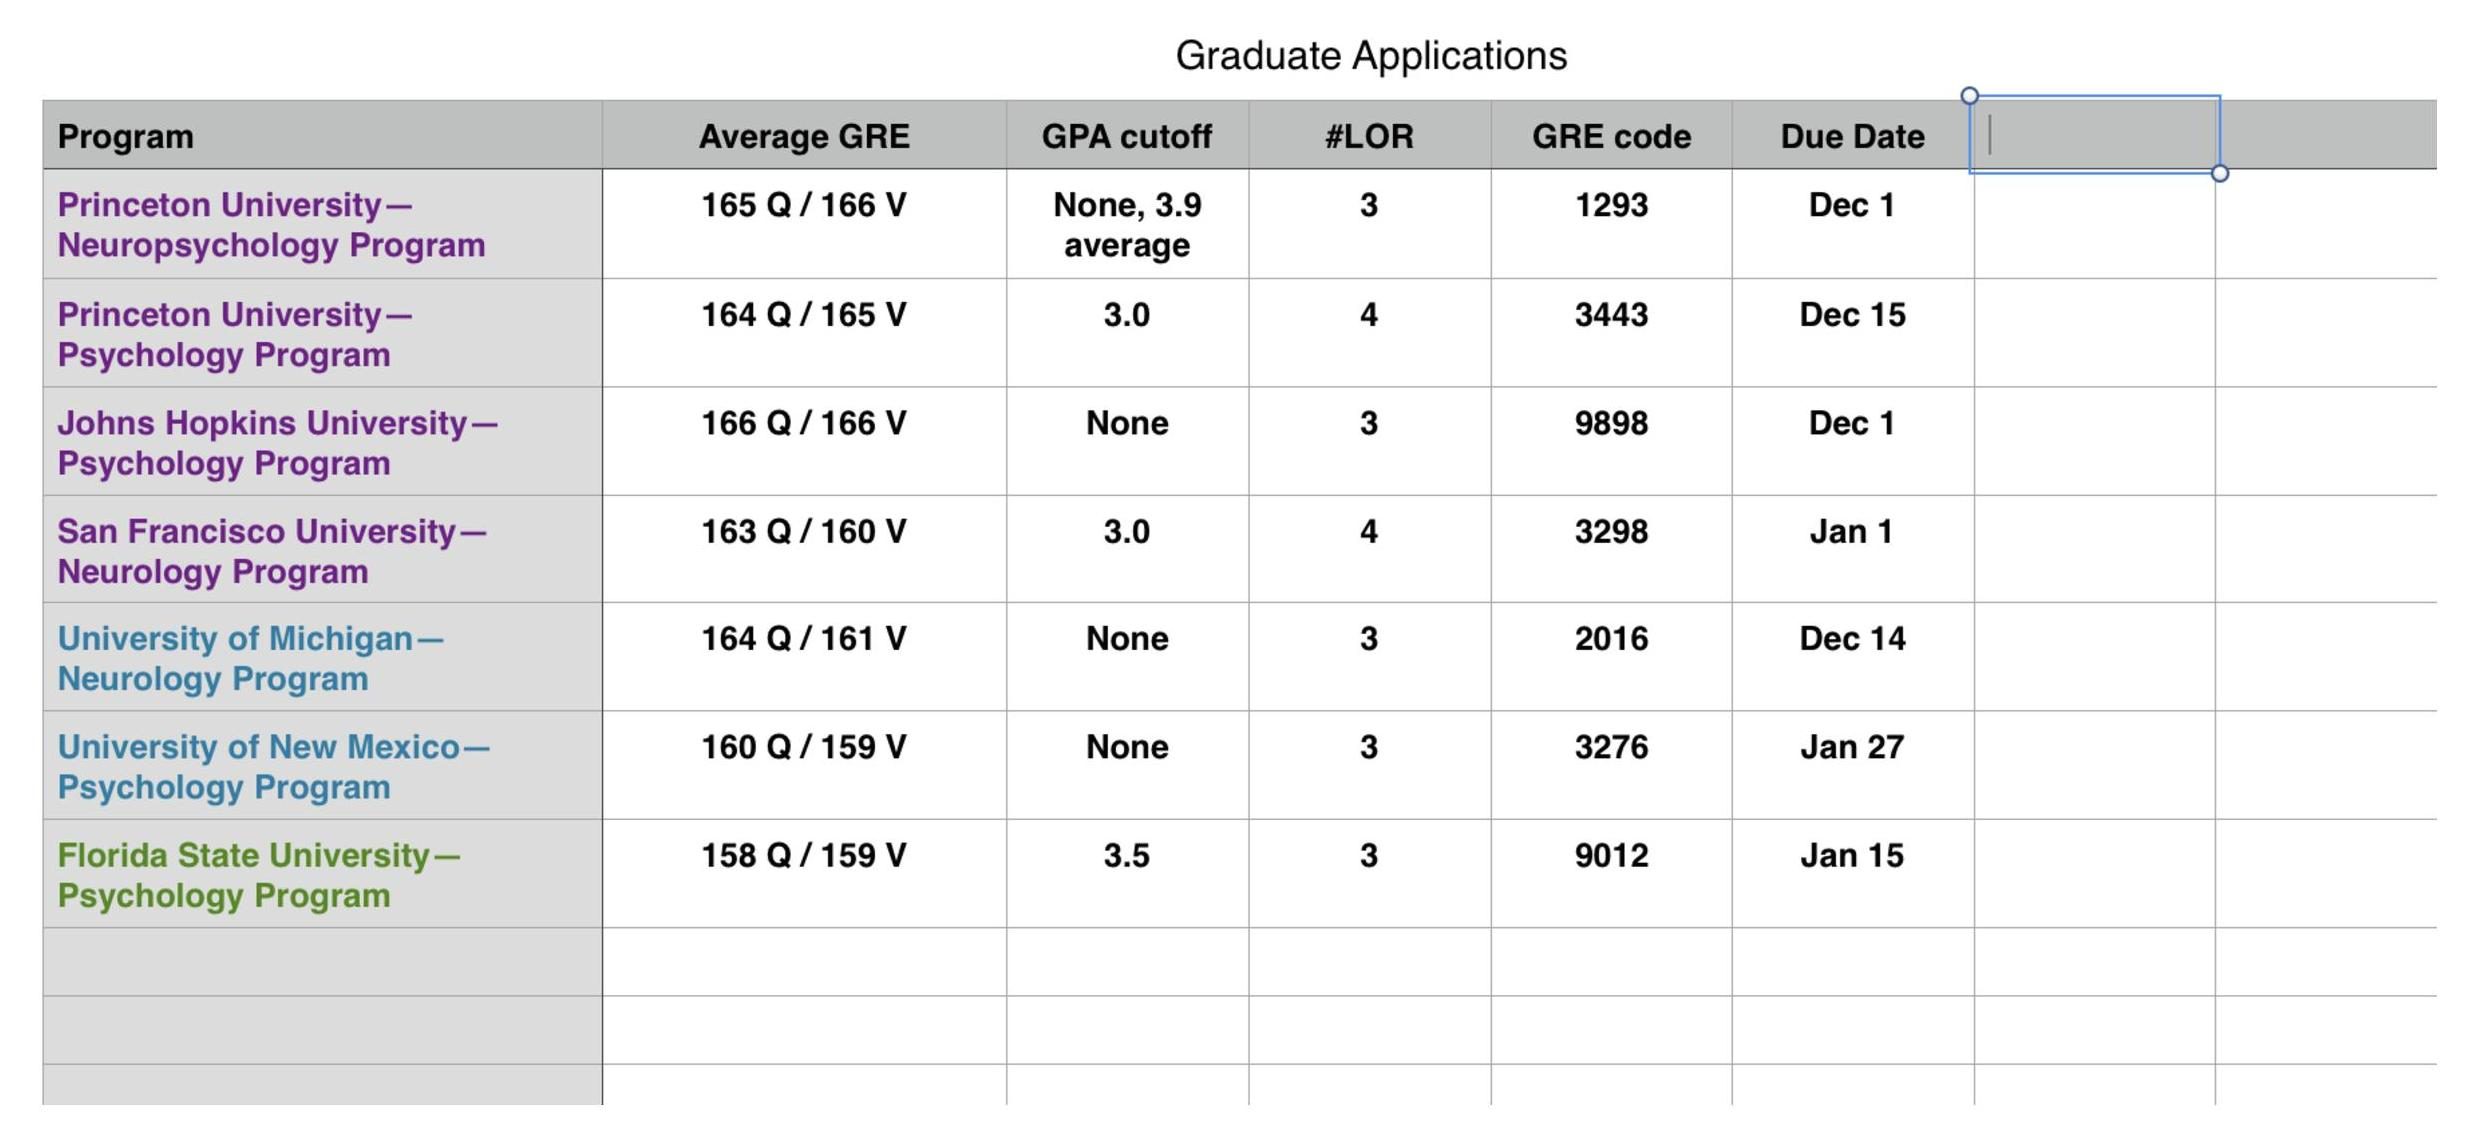 Graduate School Spreadsheet Pertaining To Academical.  Applying To Graduate School: A Beginner's Guide